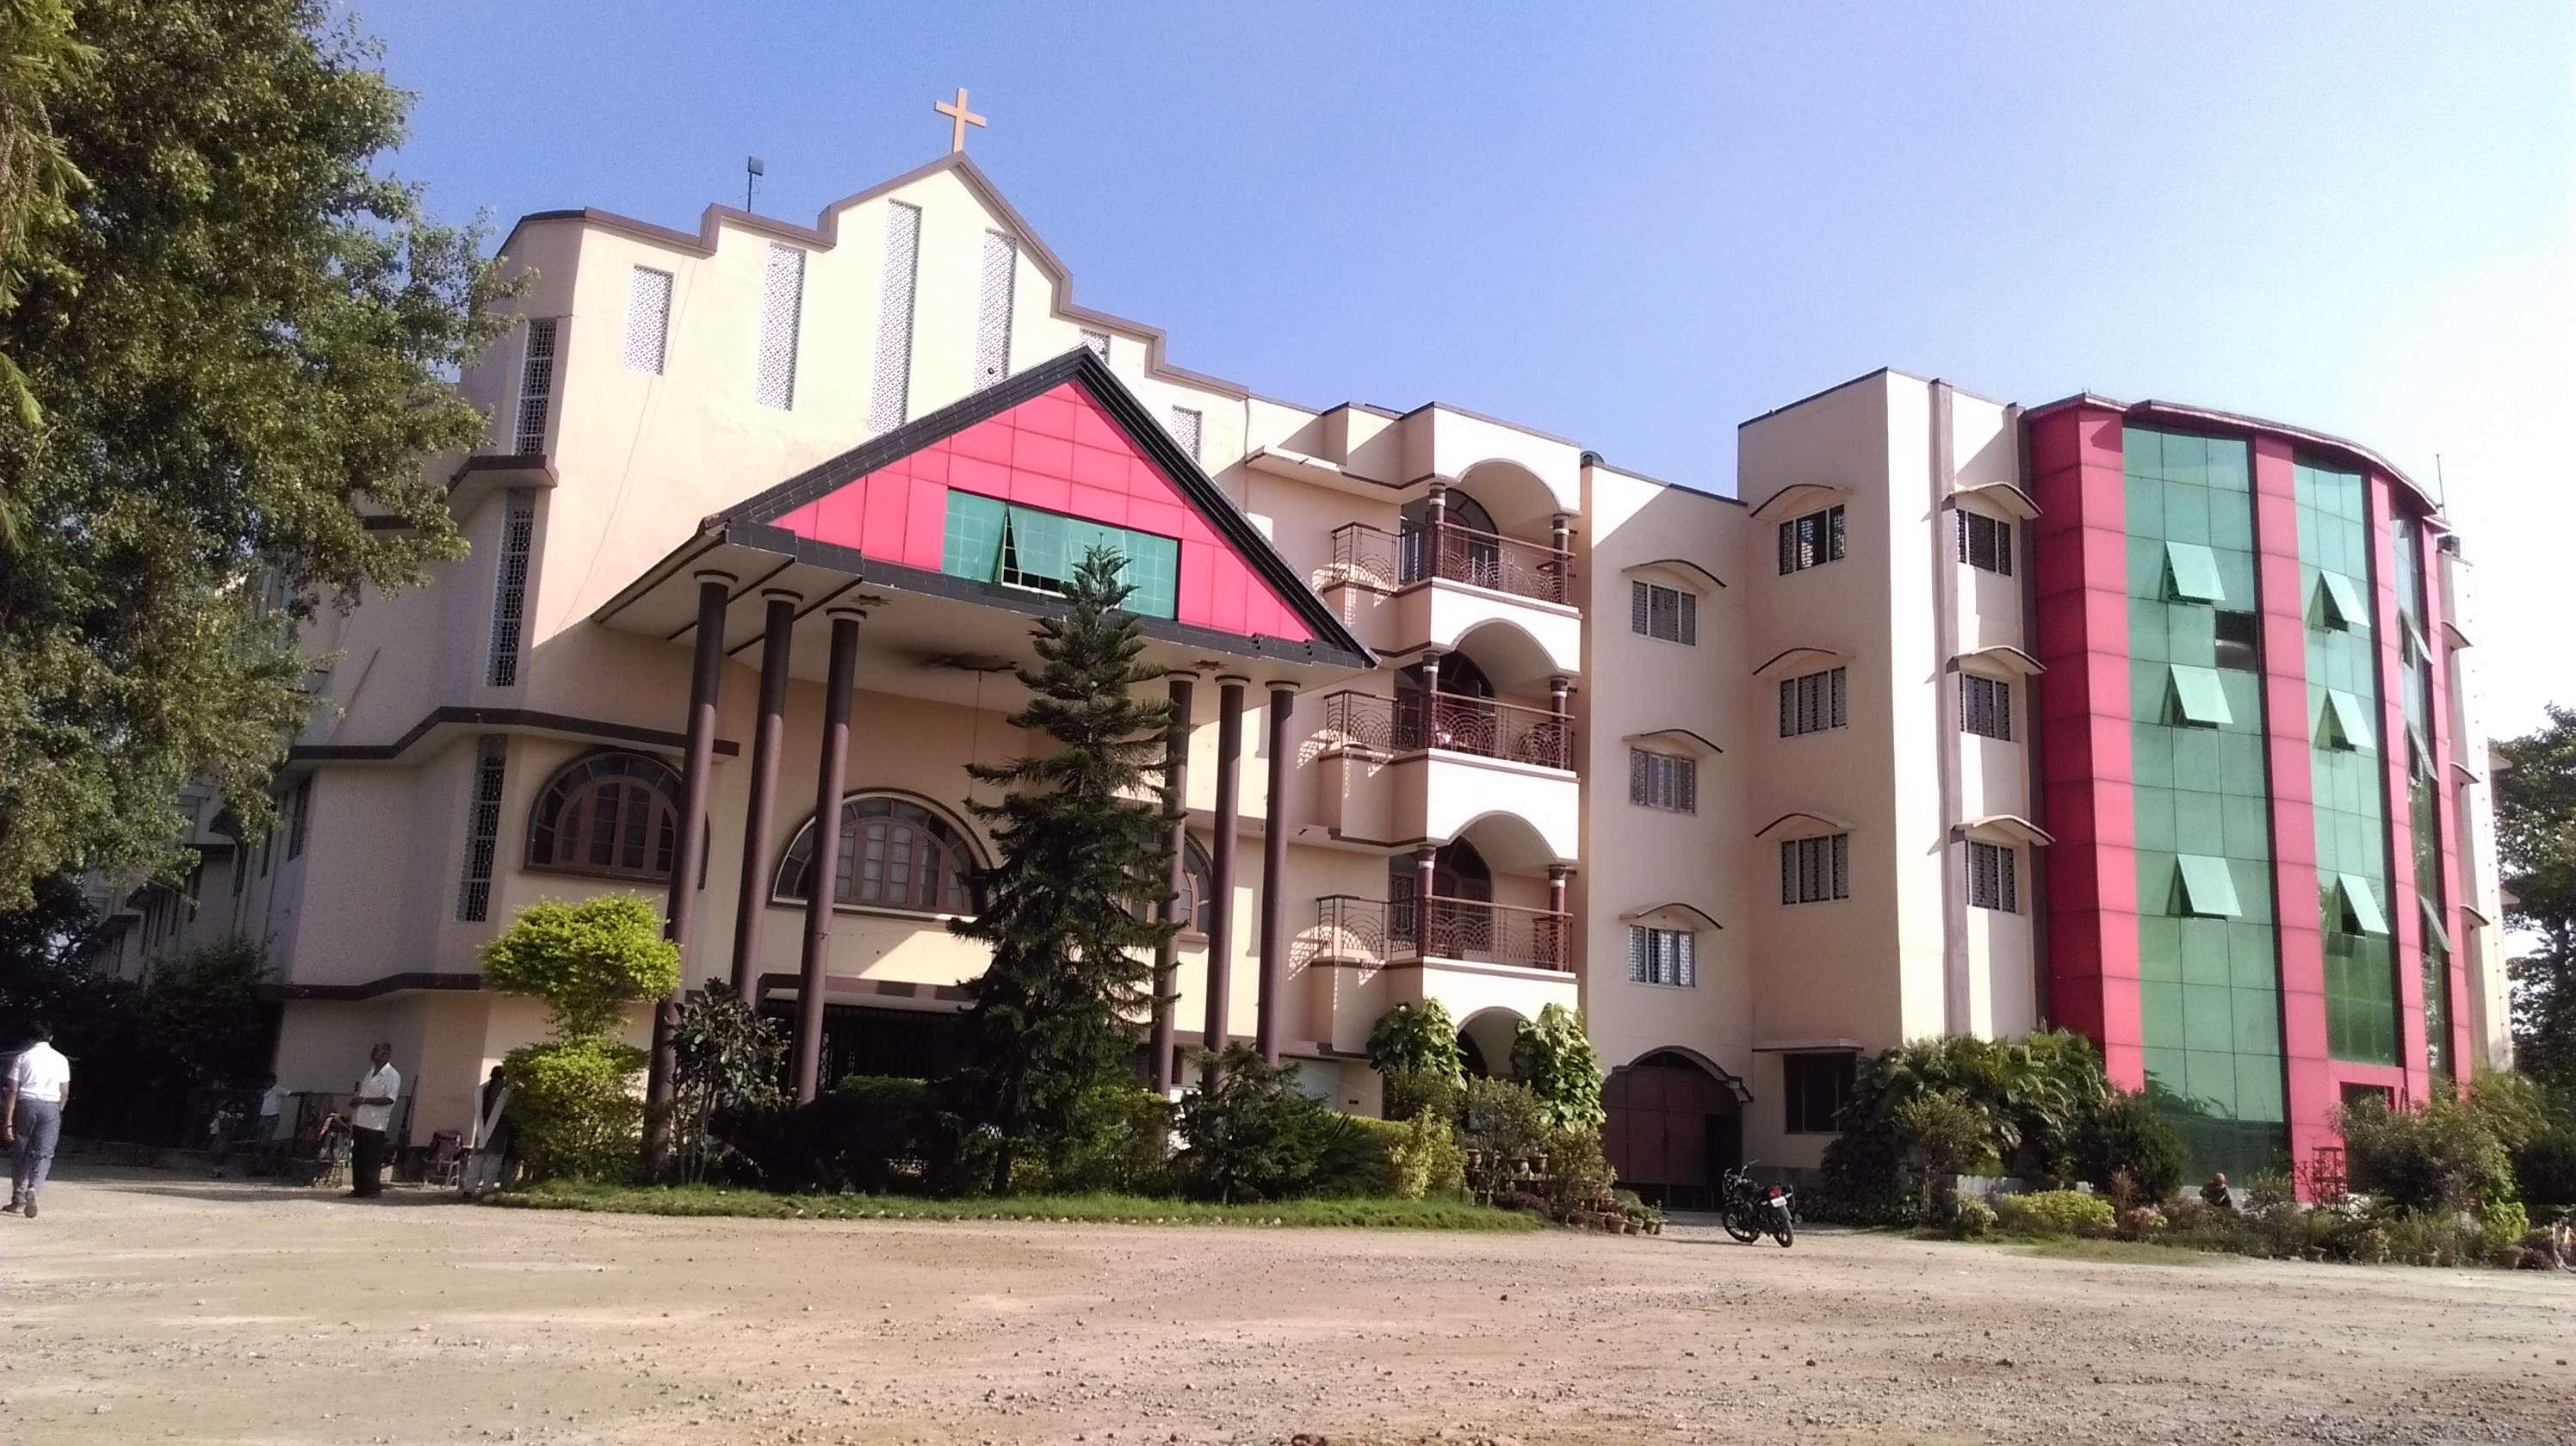 NAV JEEVAN MISSION SCHOOL NAVJEEVAN NAGAR SAPAHA ROAD KASIA